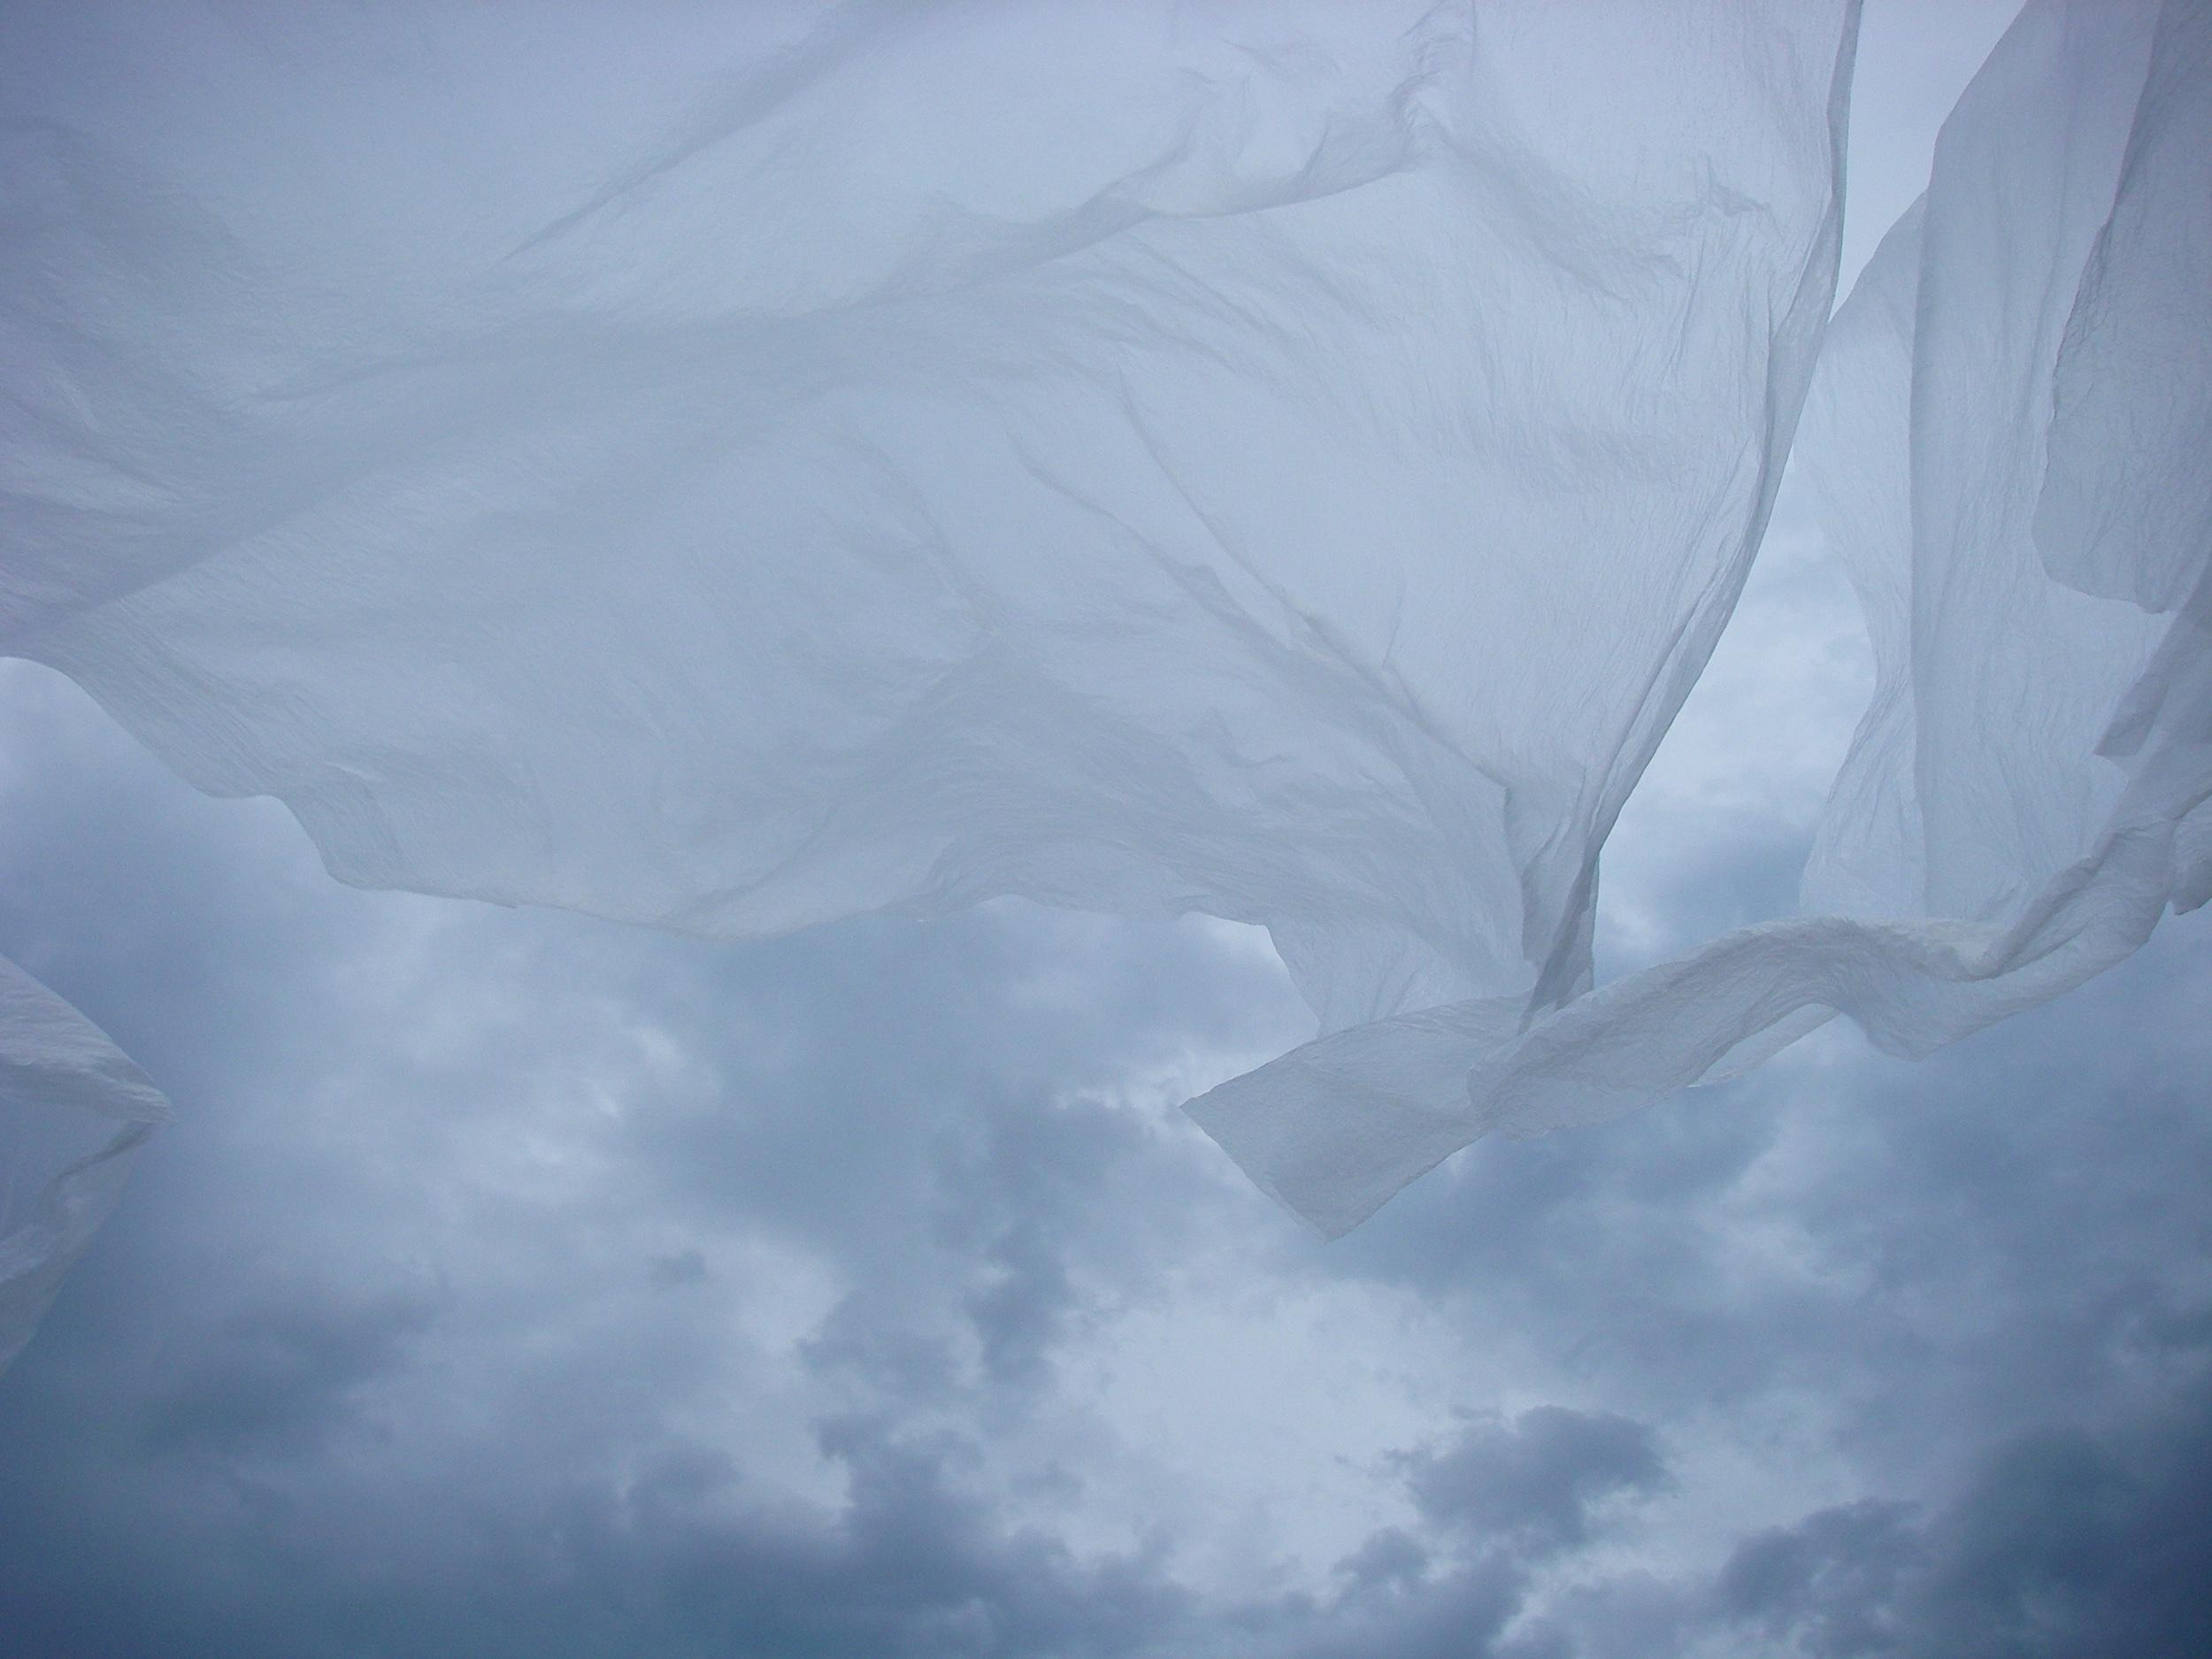 cloudforms_2500 4.jpg